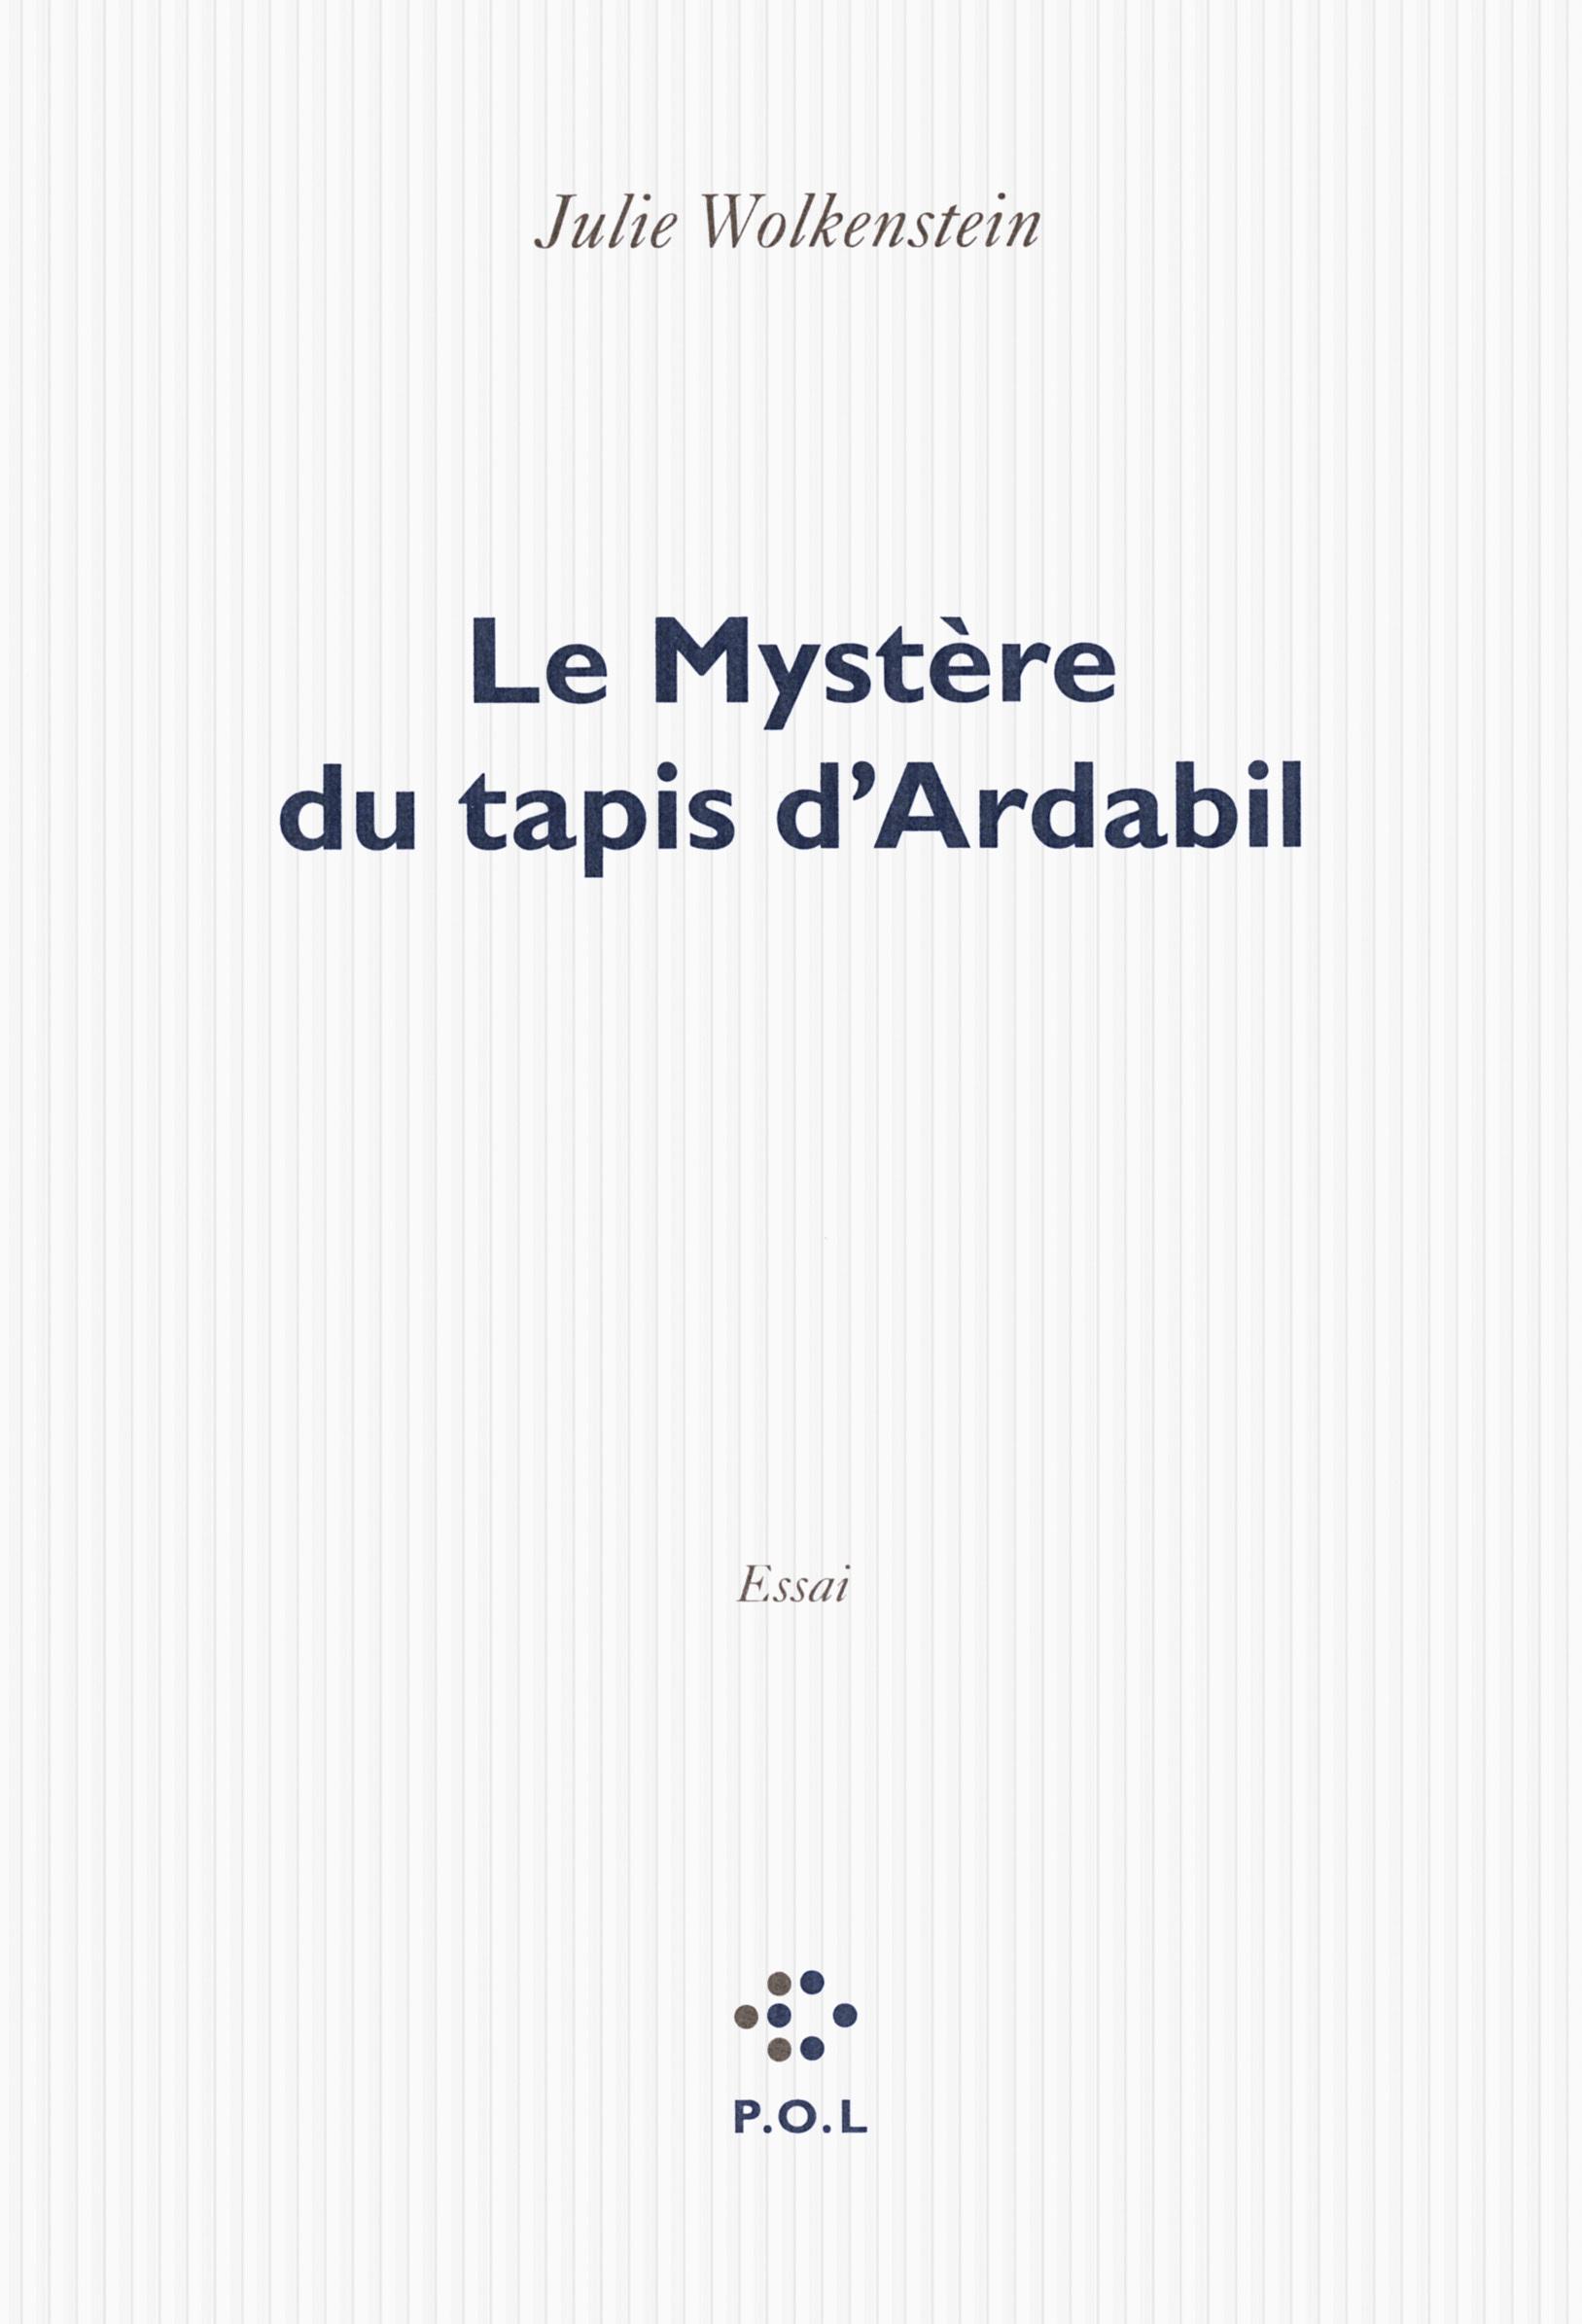 LE MYSTERE DU TAPIS D'ARDABIL